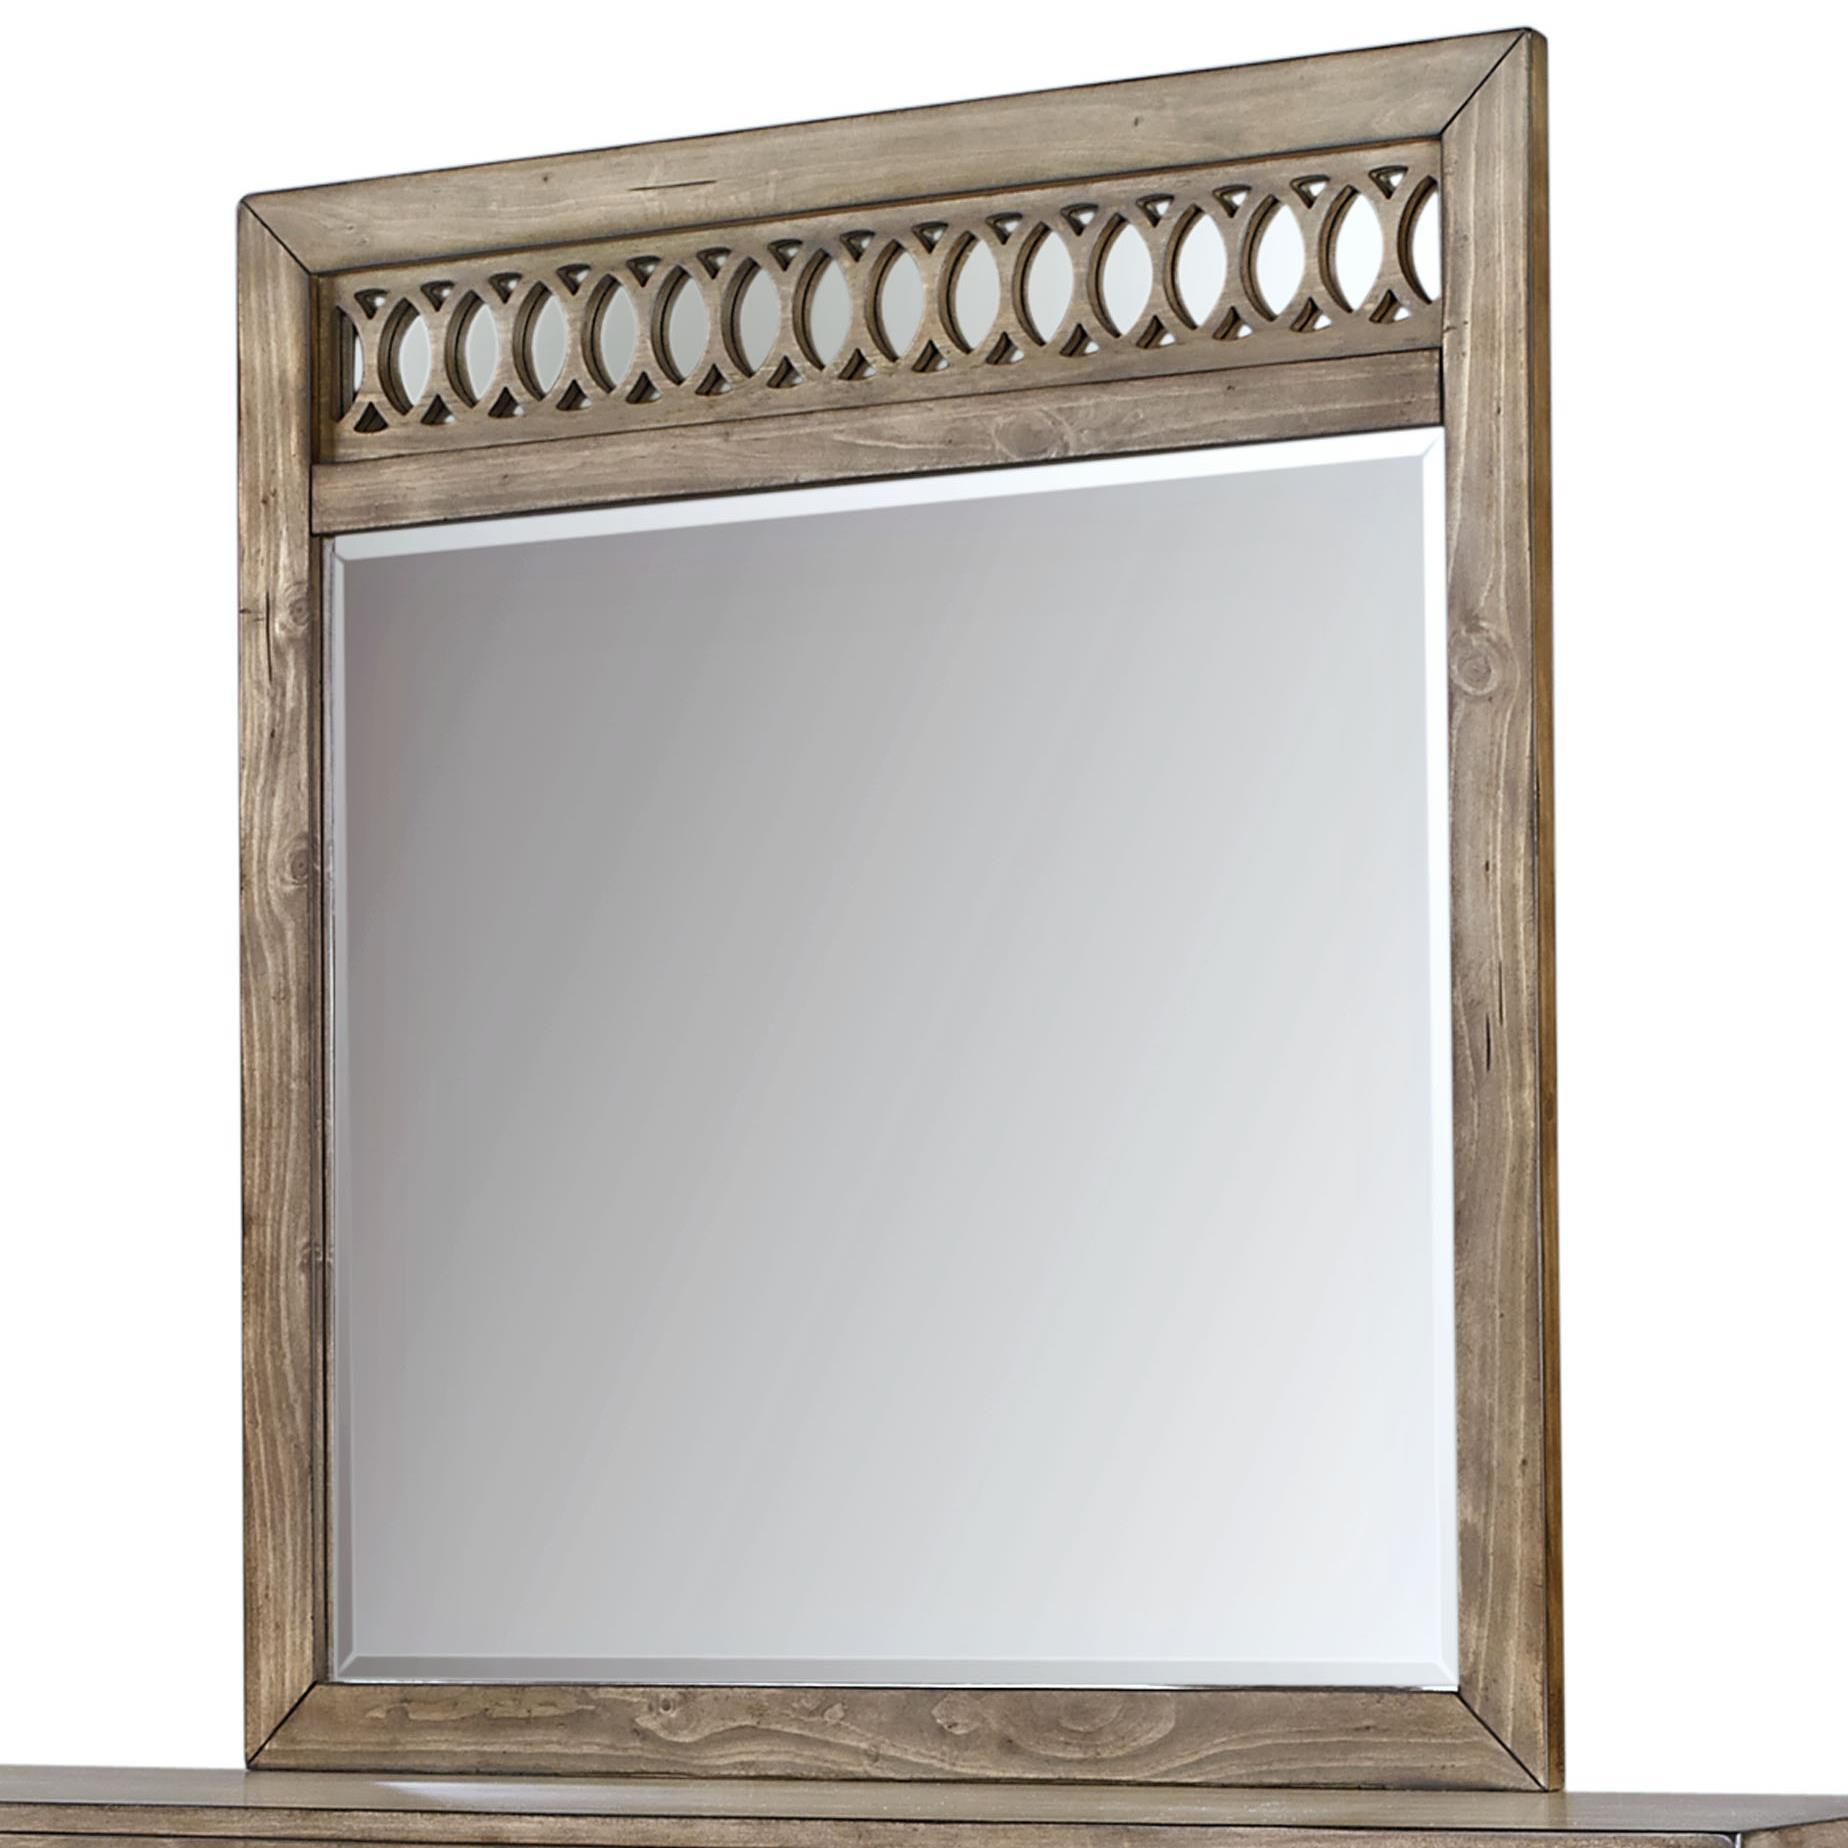 Aspenhome Tildon Fret Mirror - Item Number: I56-462